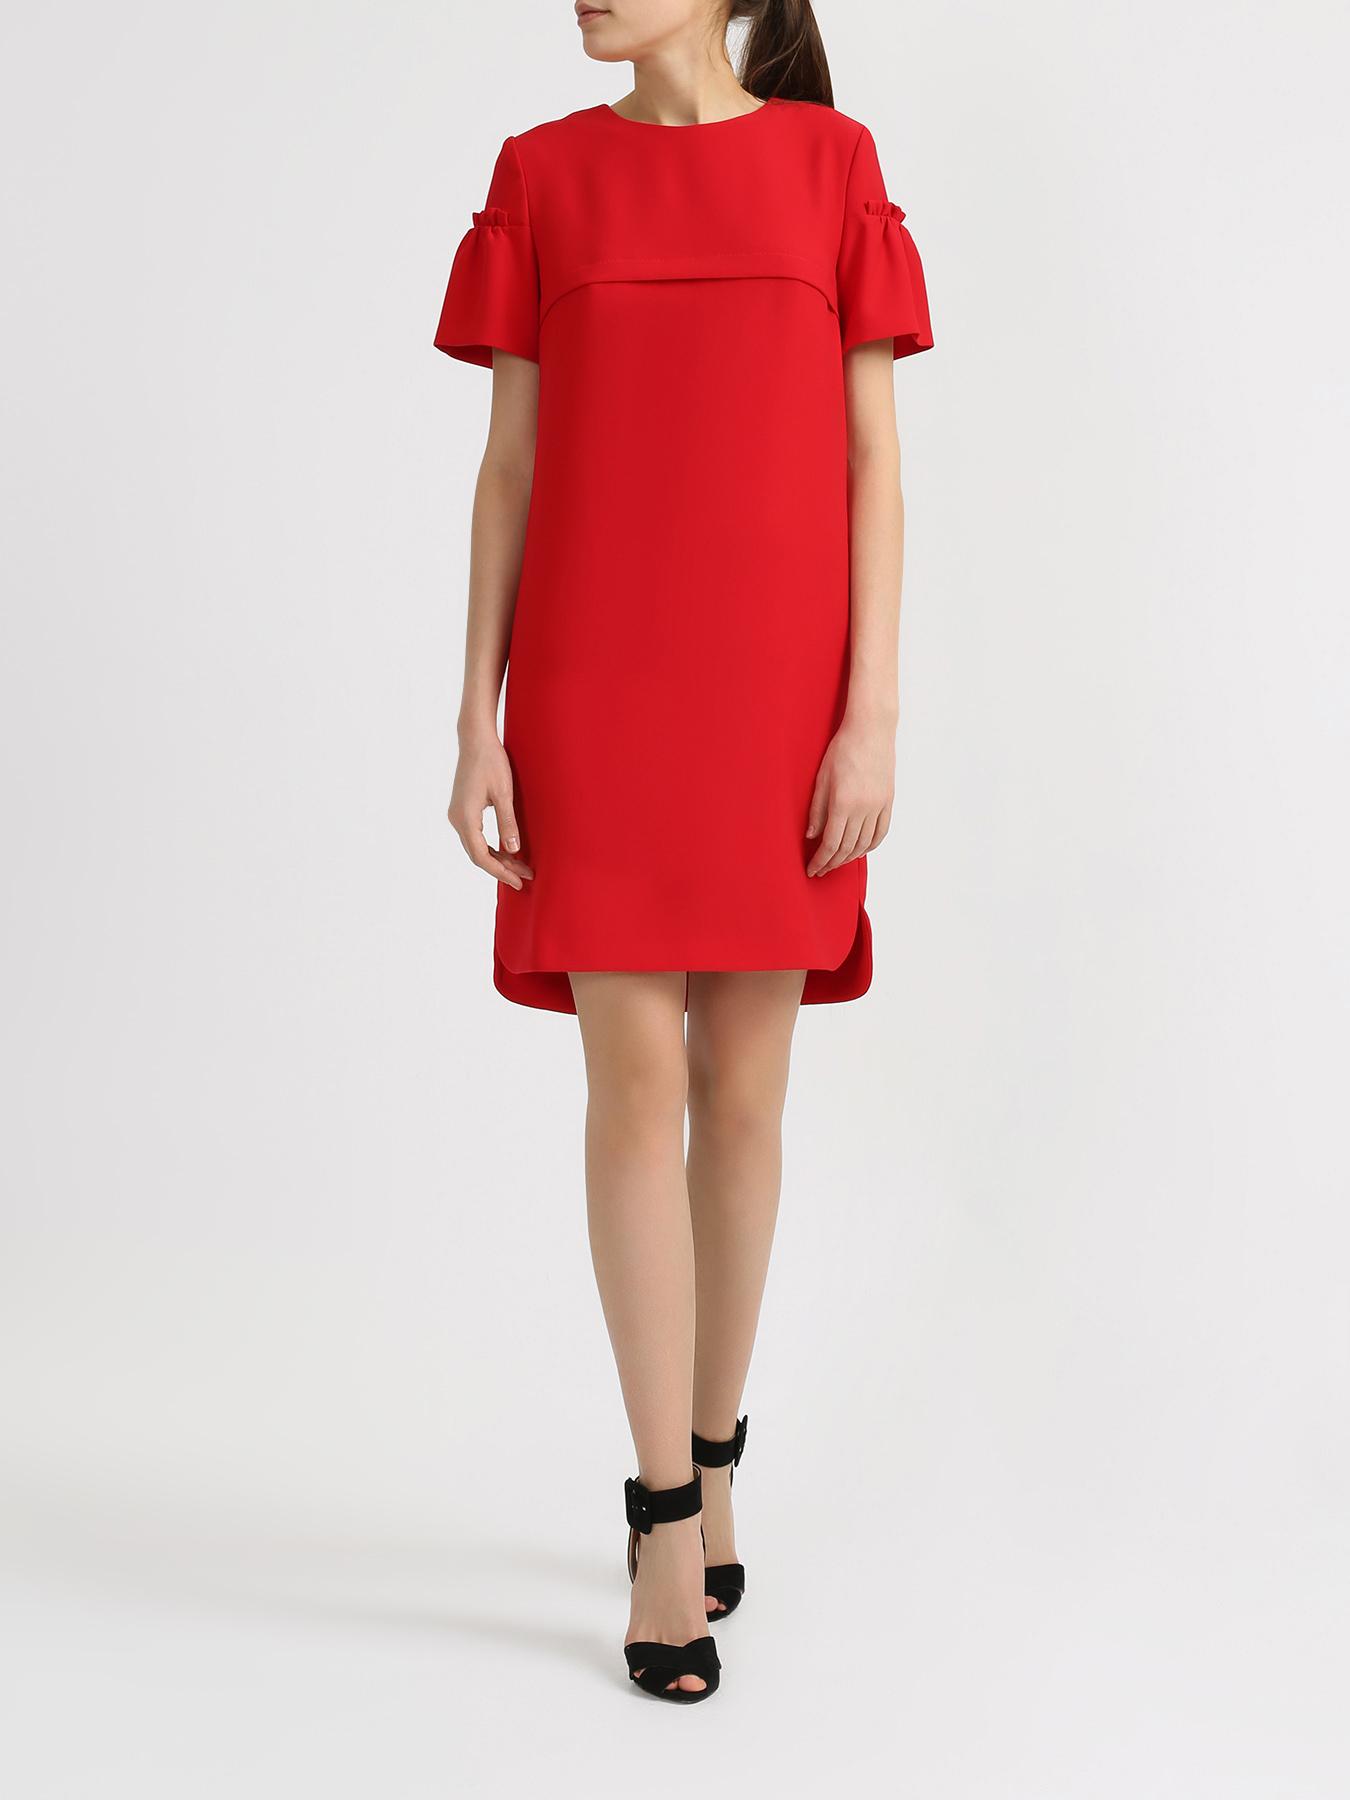 Платье Korpo Two Однотонное платье платье прямое средней длины однотонное без рукавов